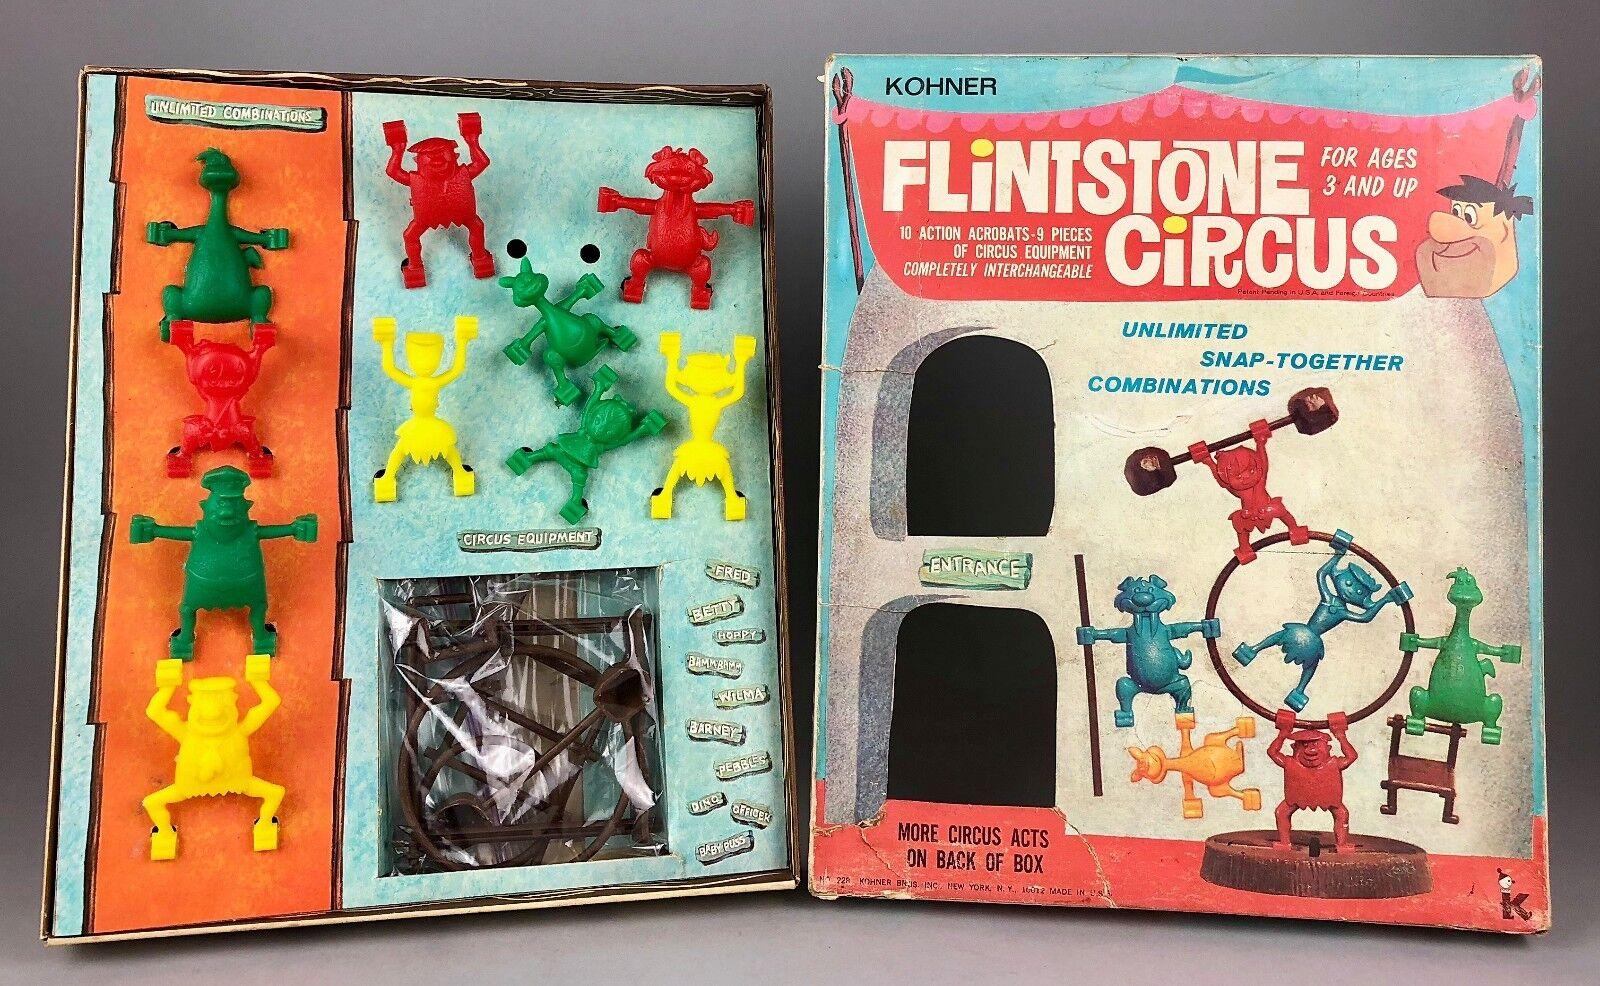 KOHNER BROS -FLINTSTONE CIRCUS- VINTAGE ACROBAT BOARD GAME PLAY SET 228 -BOXED-